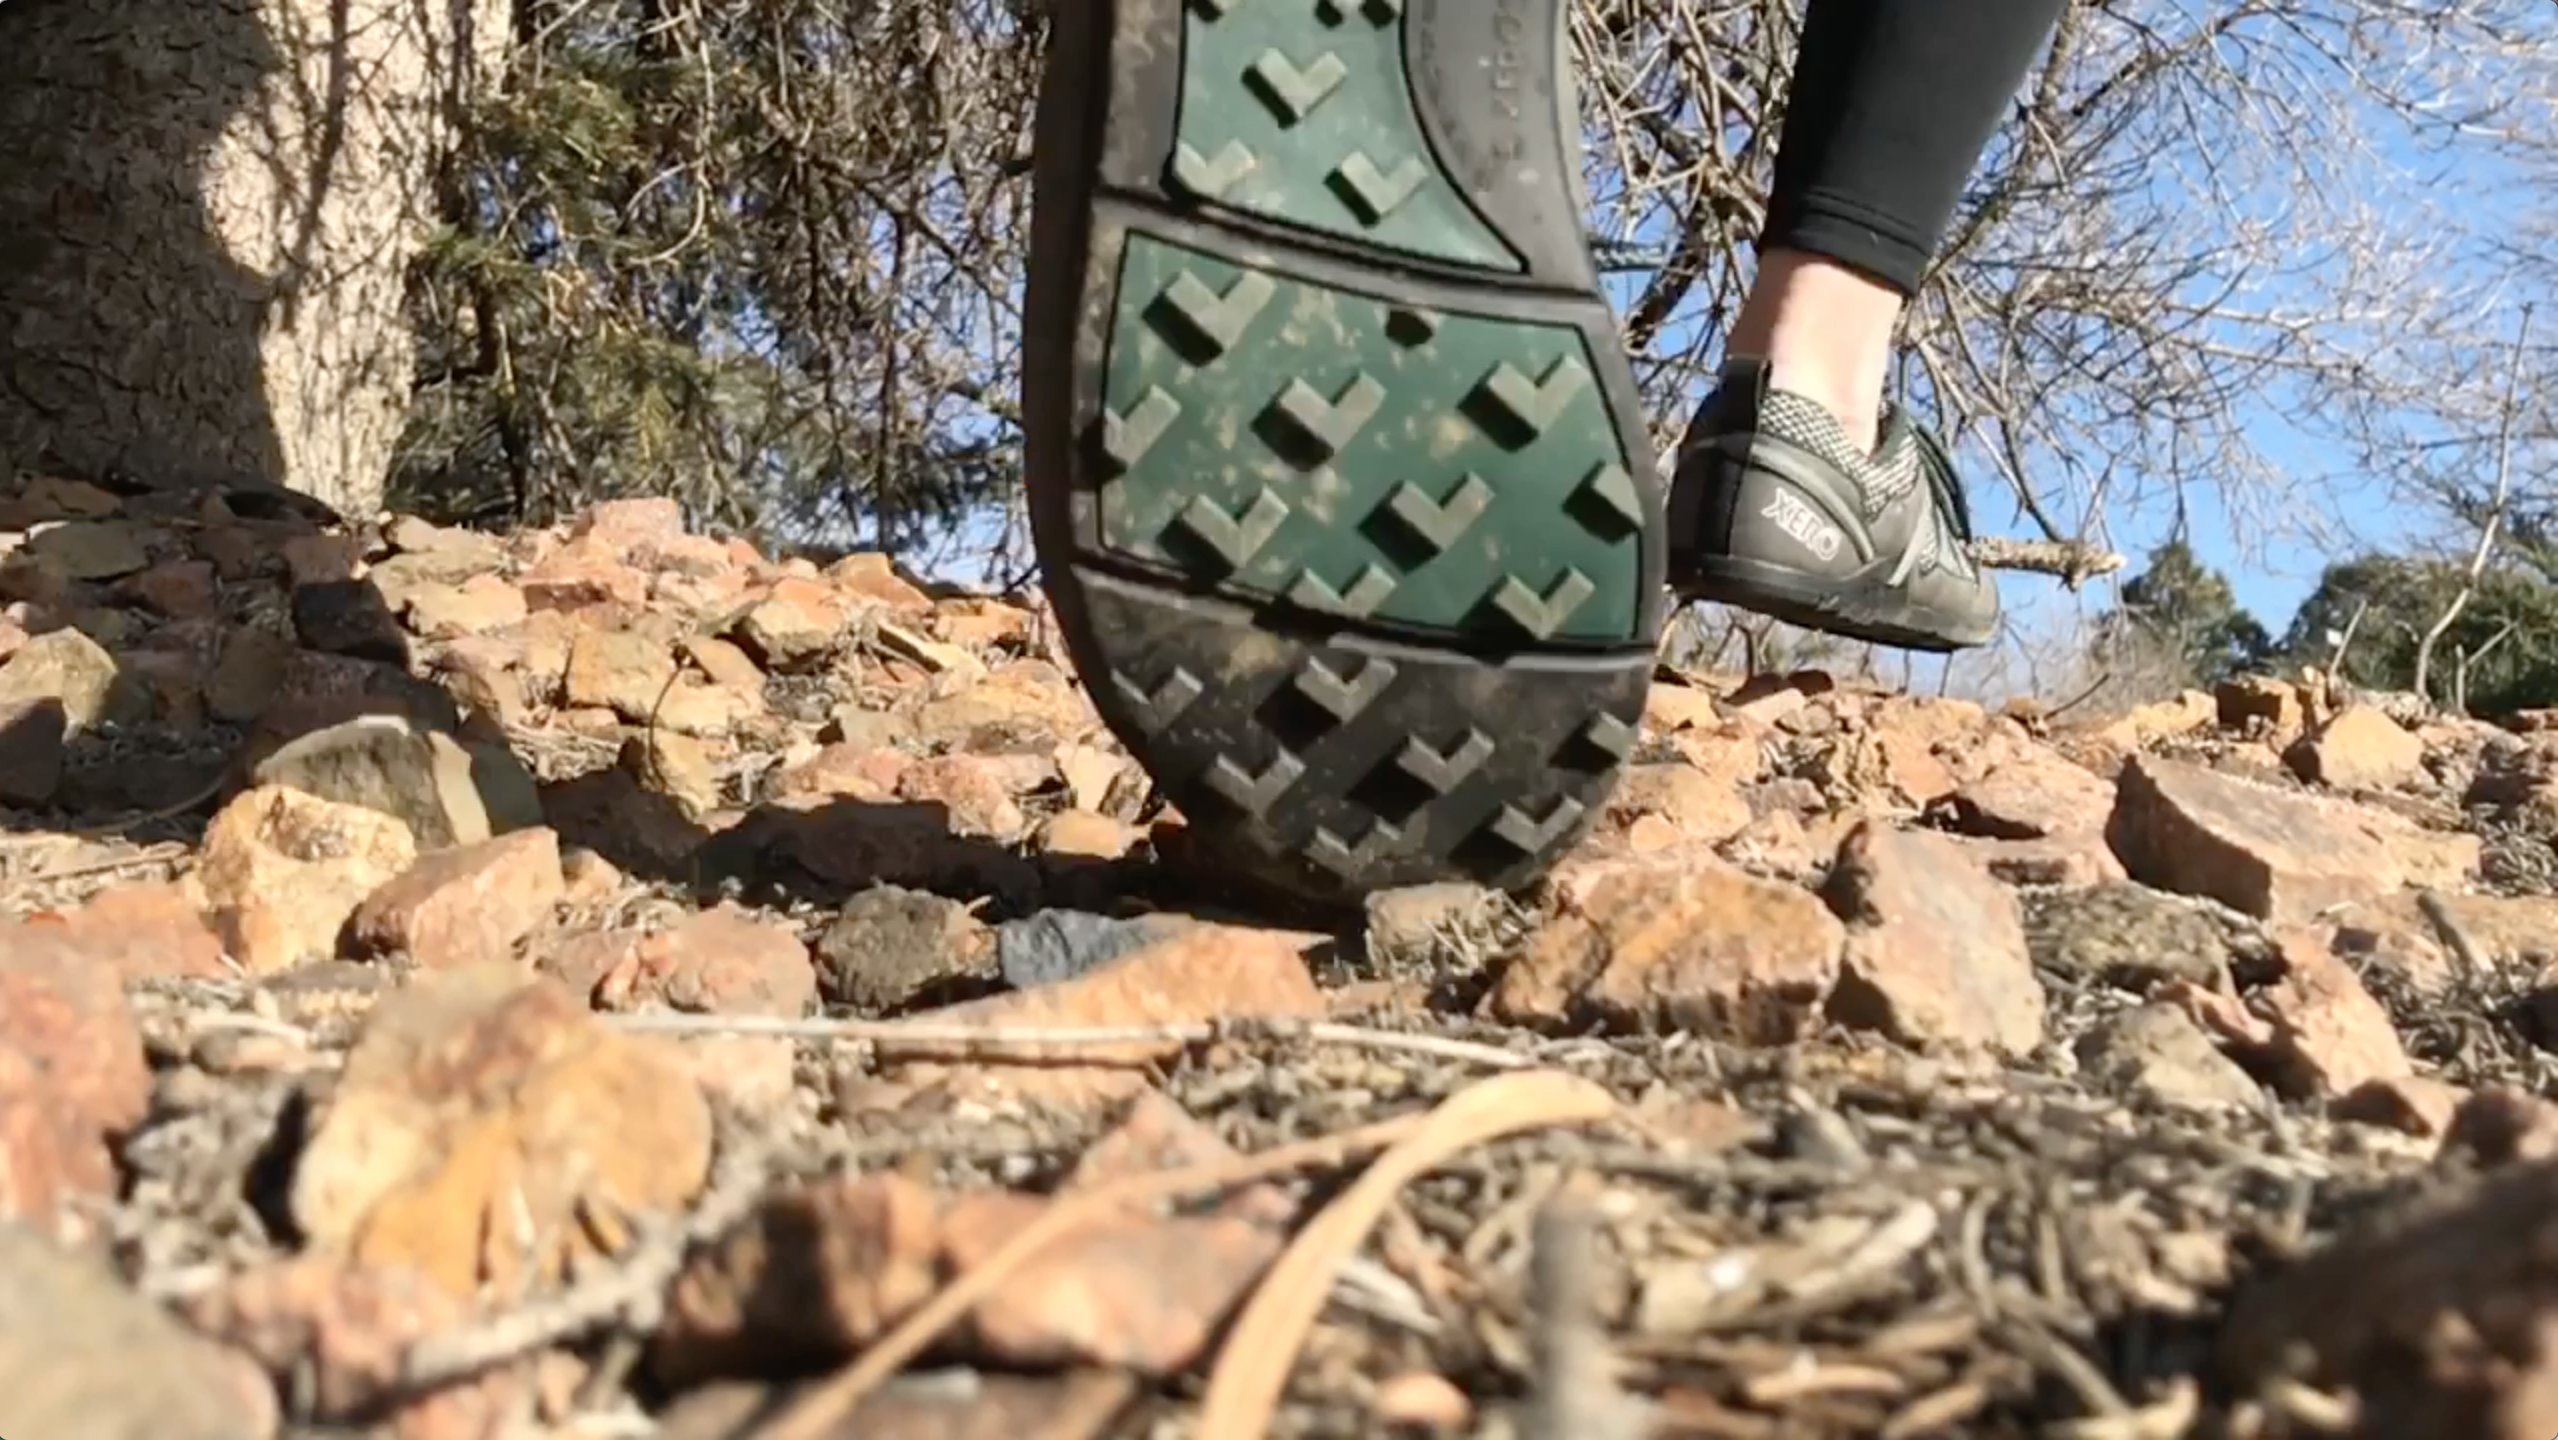 Xero Shoes TerraFlex Trail Running Hiking Shoe - Minimalist Zero-Drop Lightweight Barefoot-Inspired - Men, Forest Green, 10 D(M) US by Xero Shoes (Image #6)